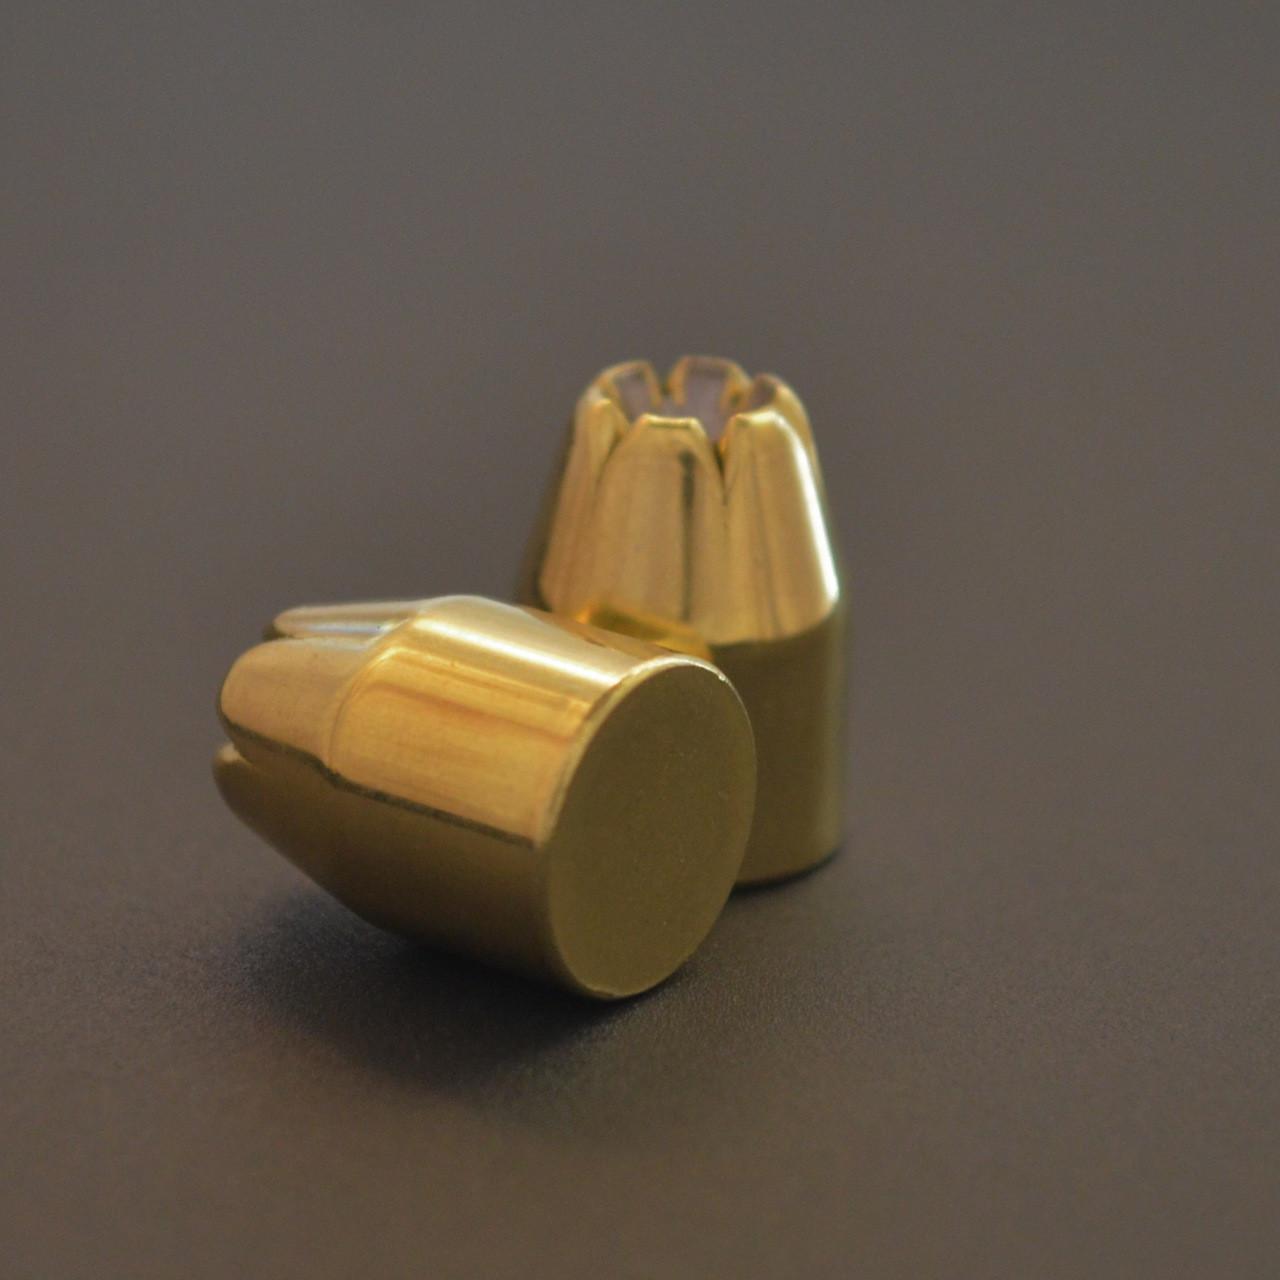 10mm/.40 155gr JHP - 500ct